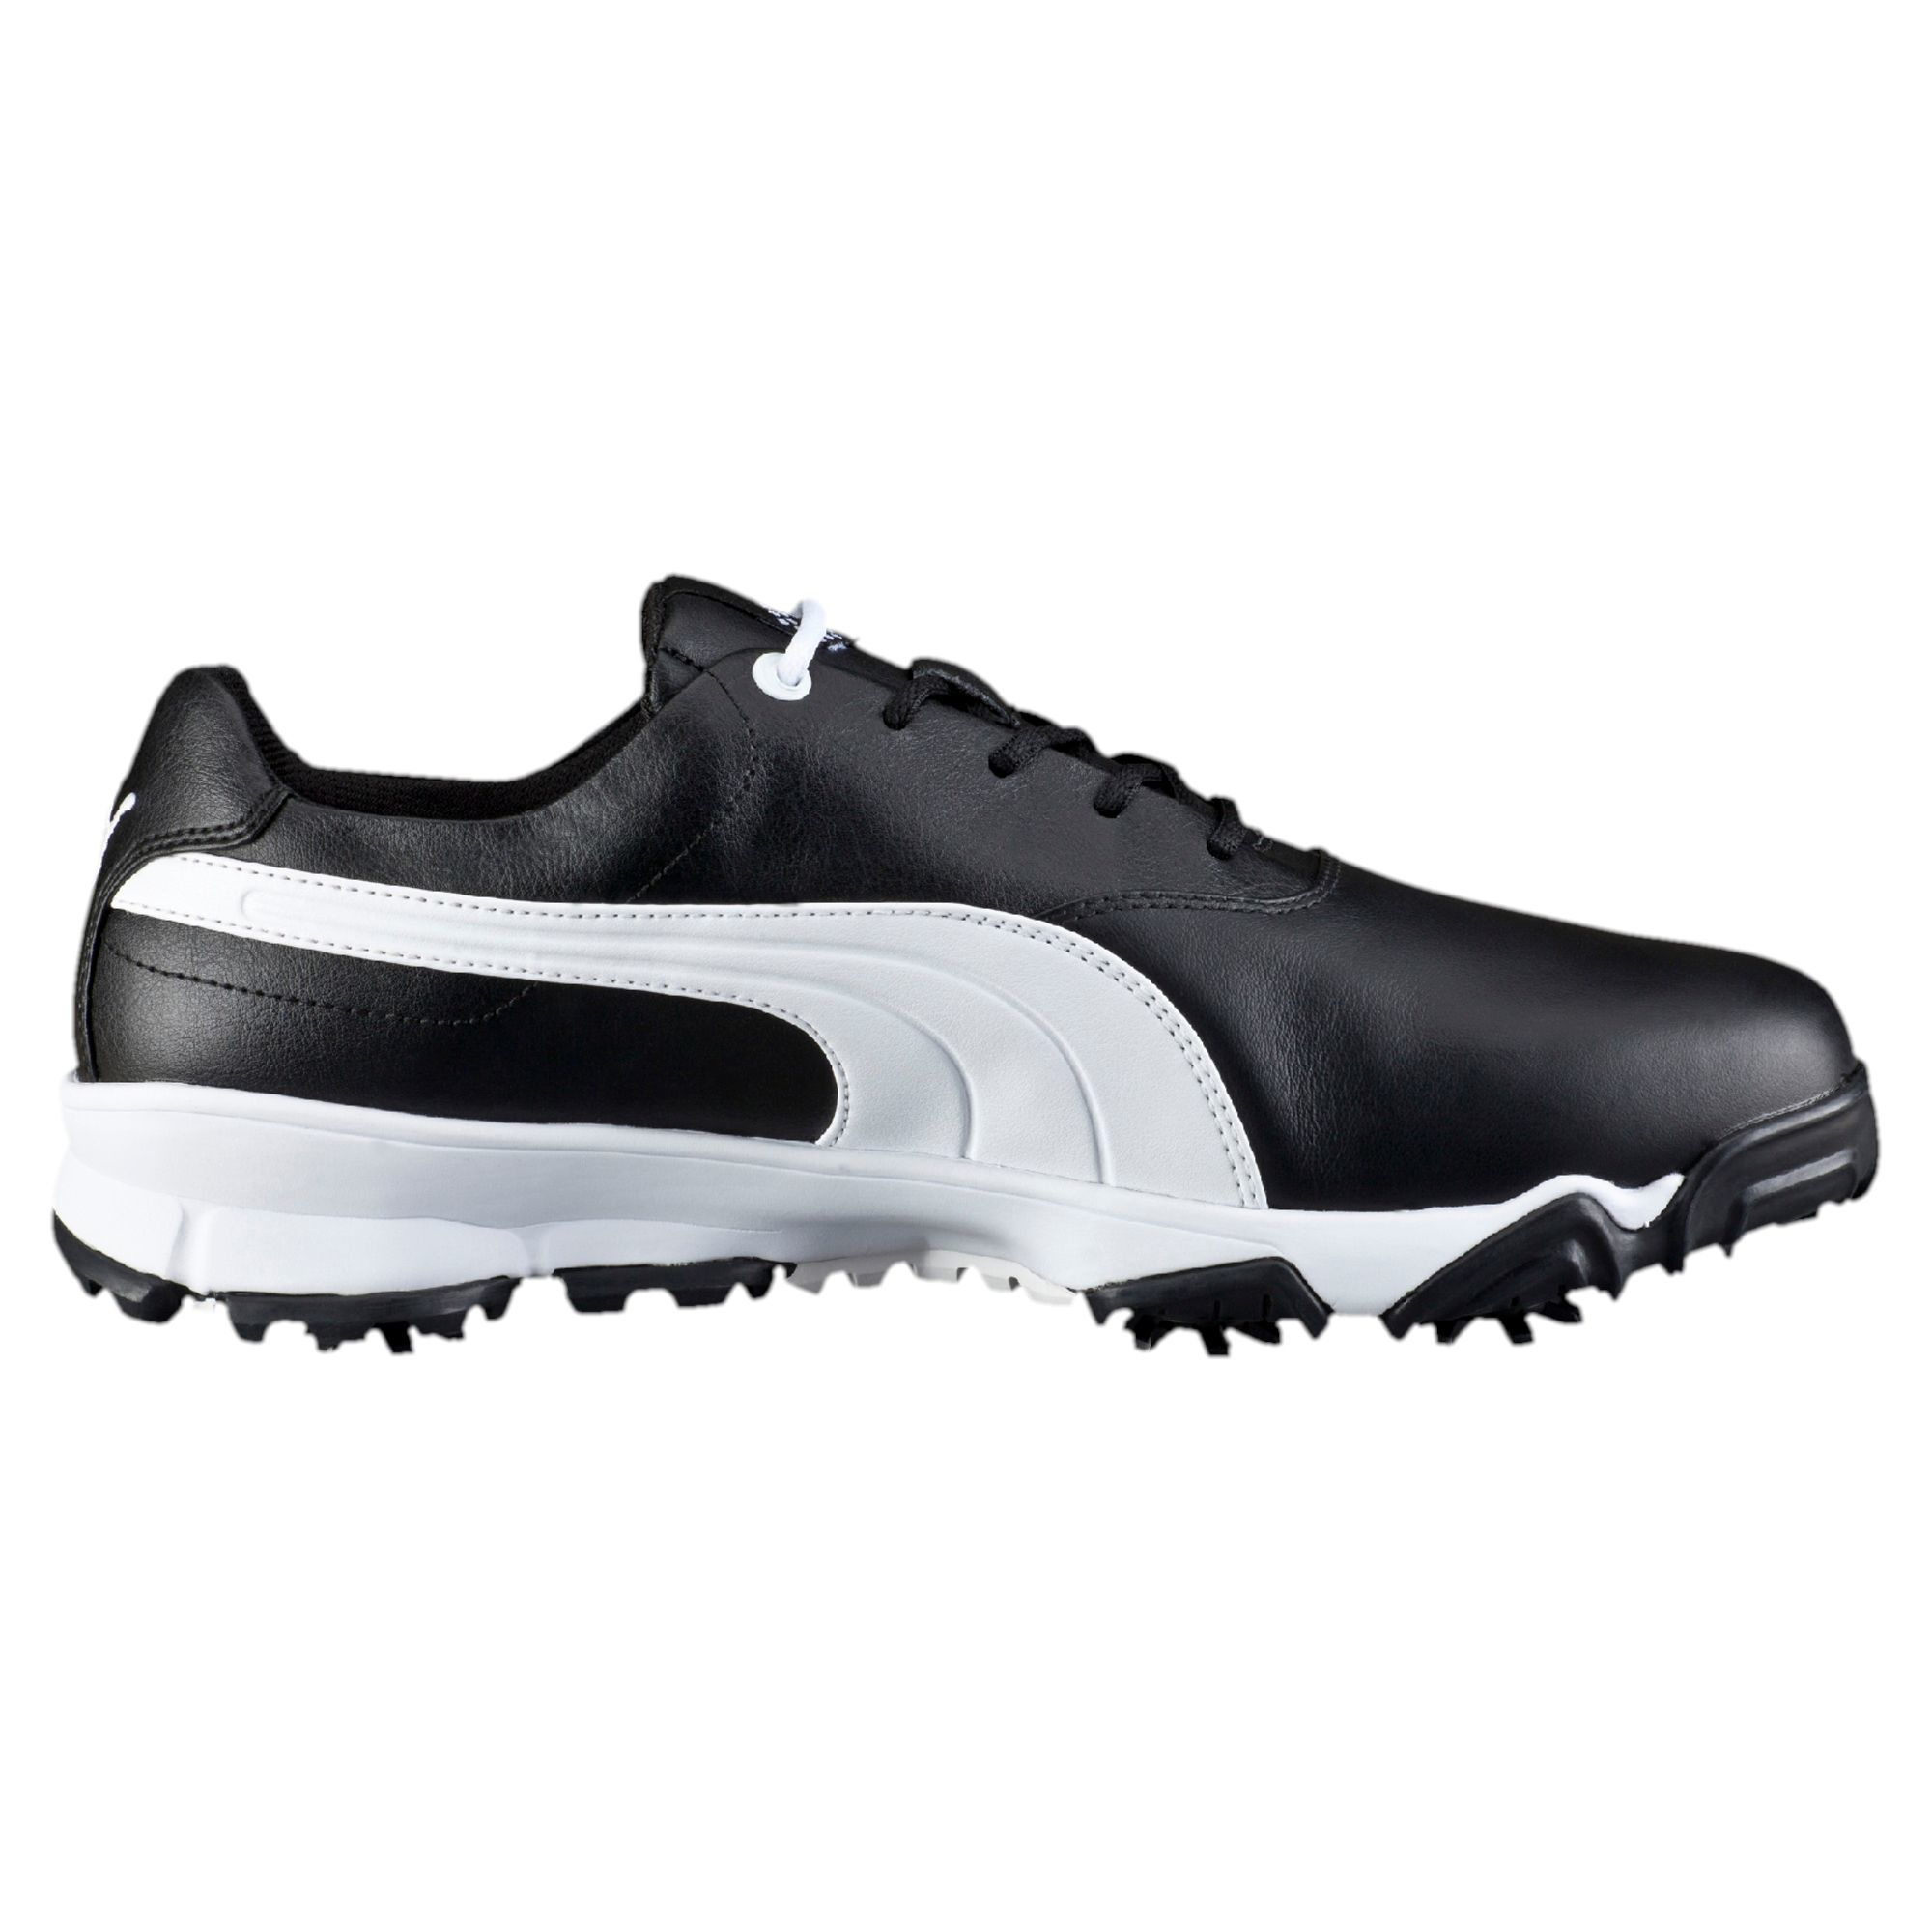 Puma Ace Golf Shoes Black White